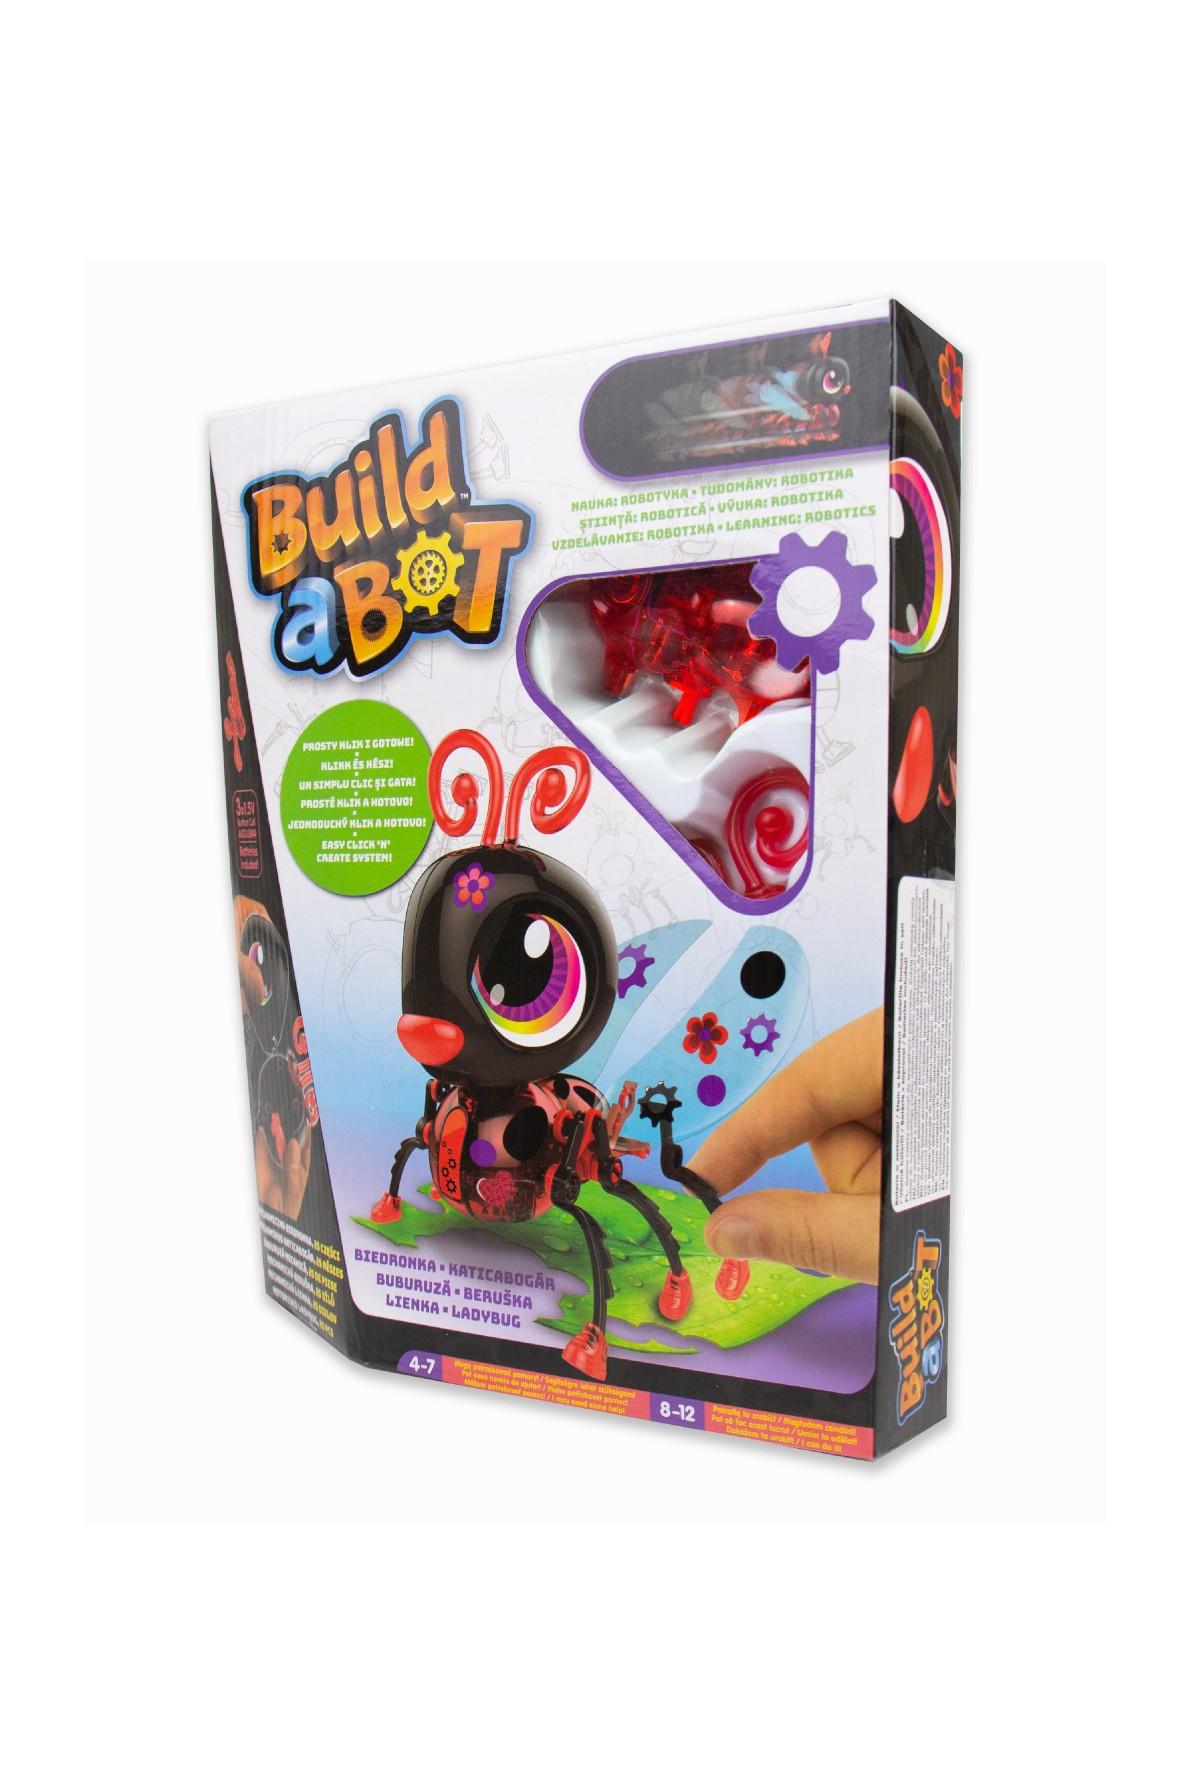 Build-A-Bot Biedronka